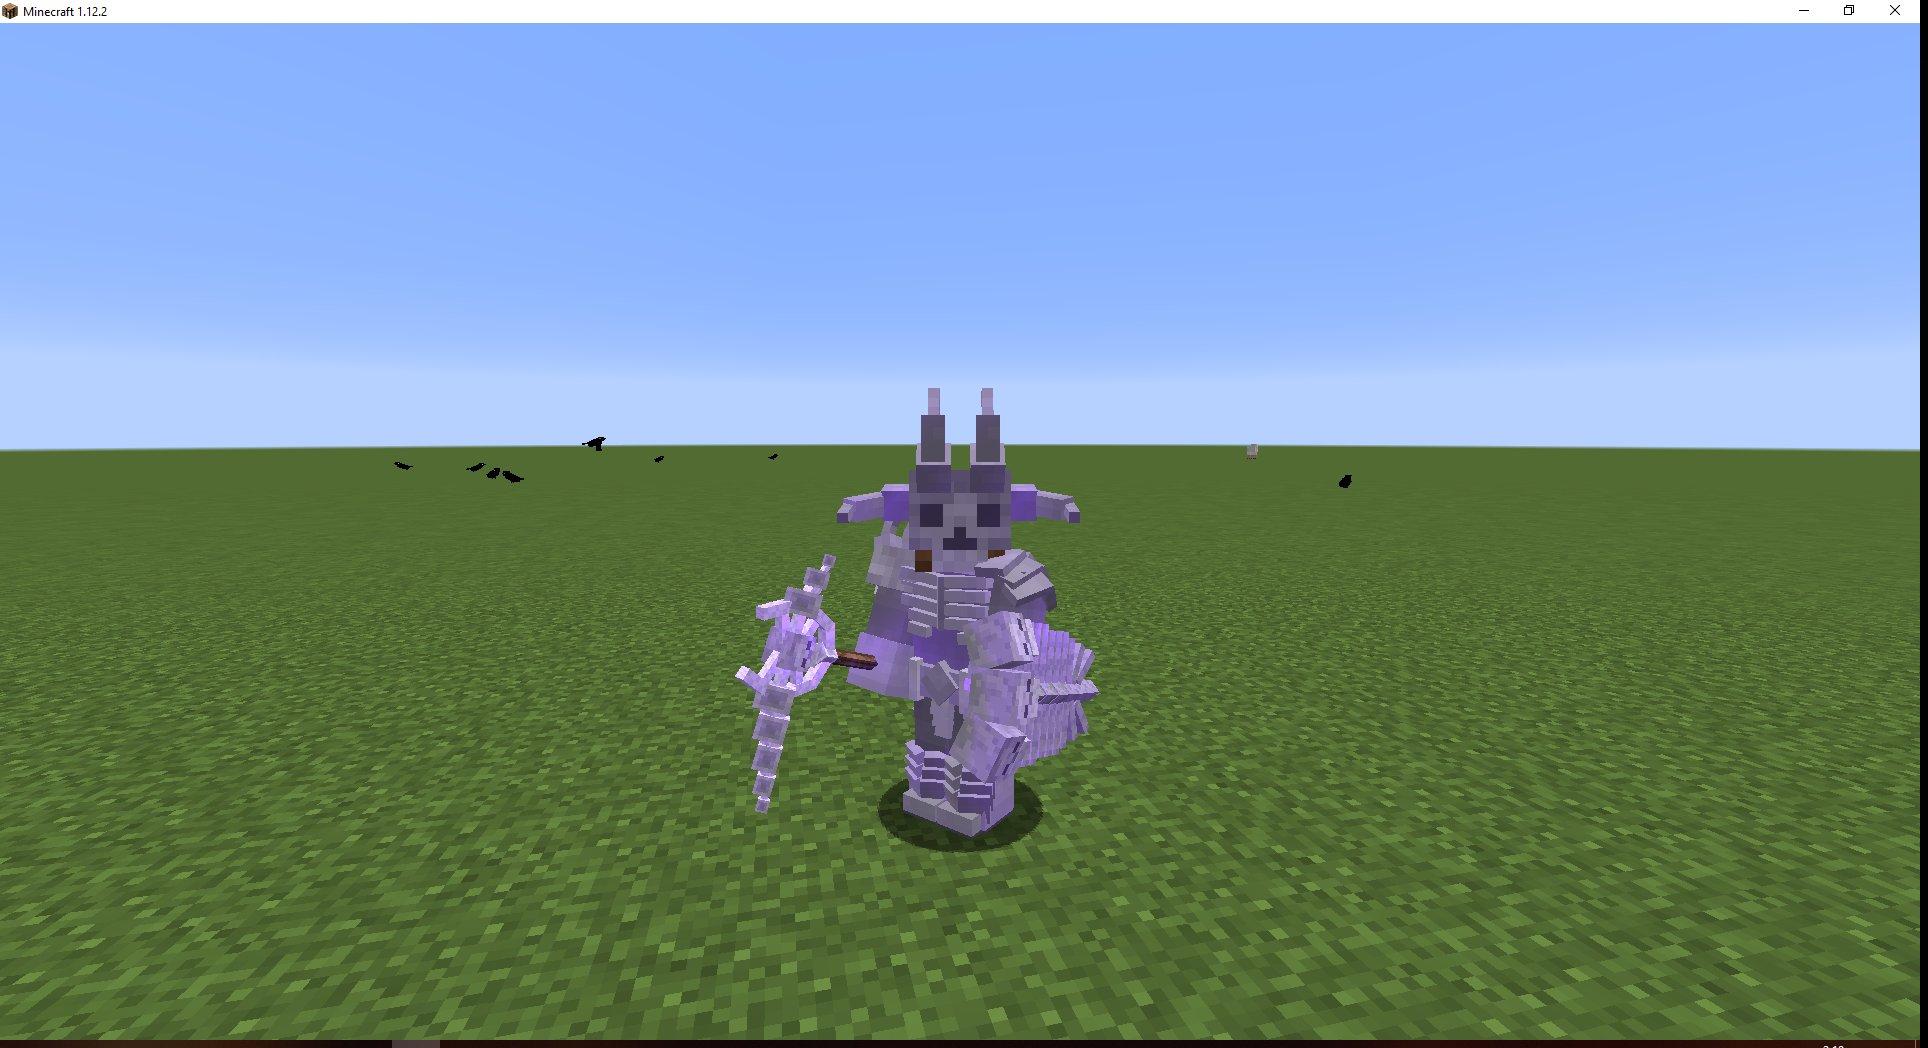 Gravestone mod - Minecraft Mods - Mapping and Modding: Java